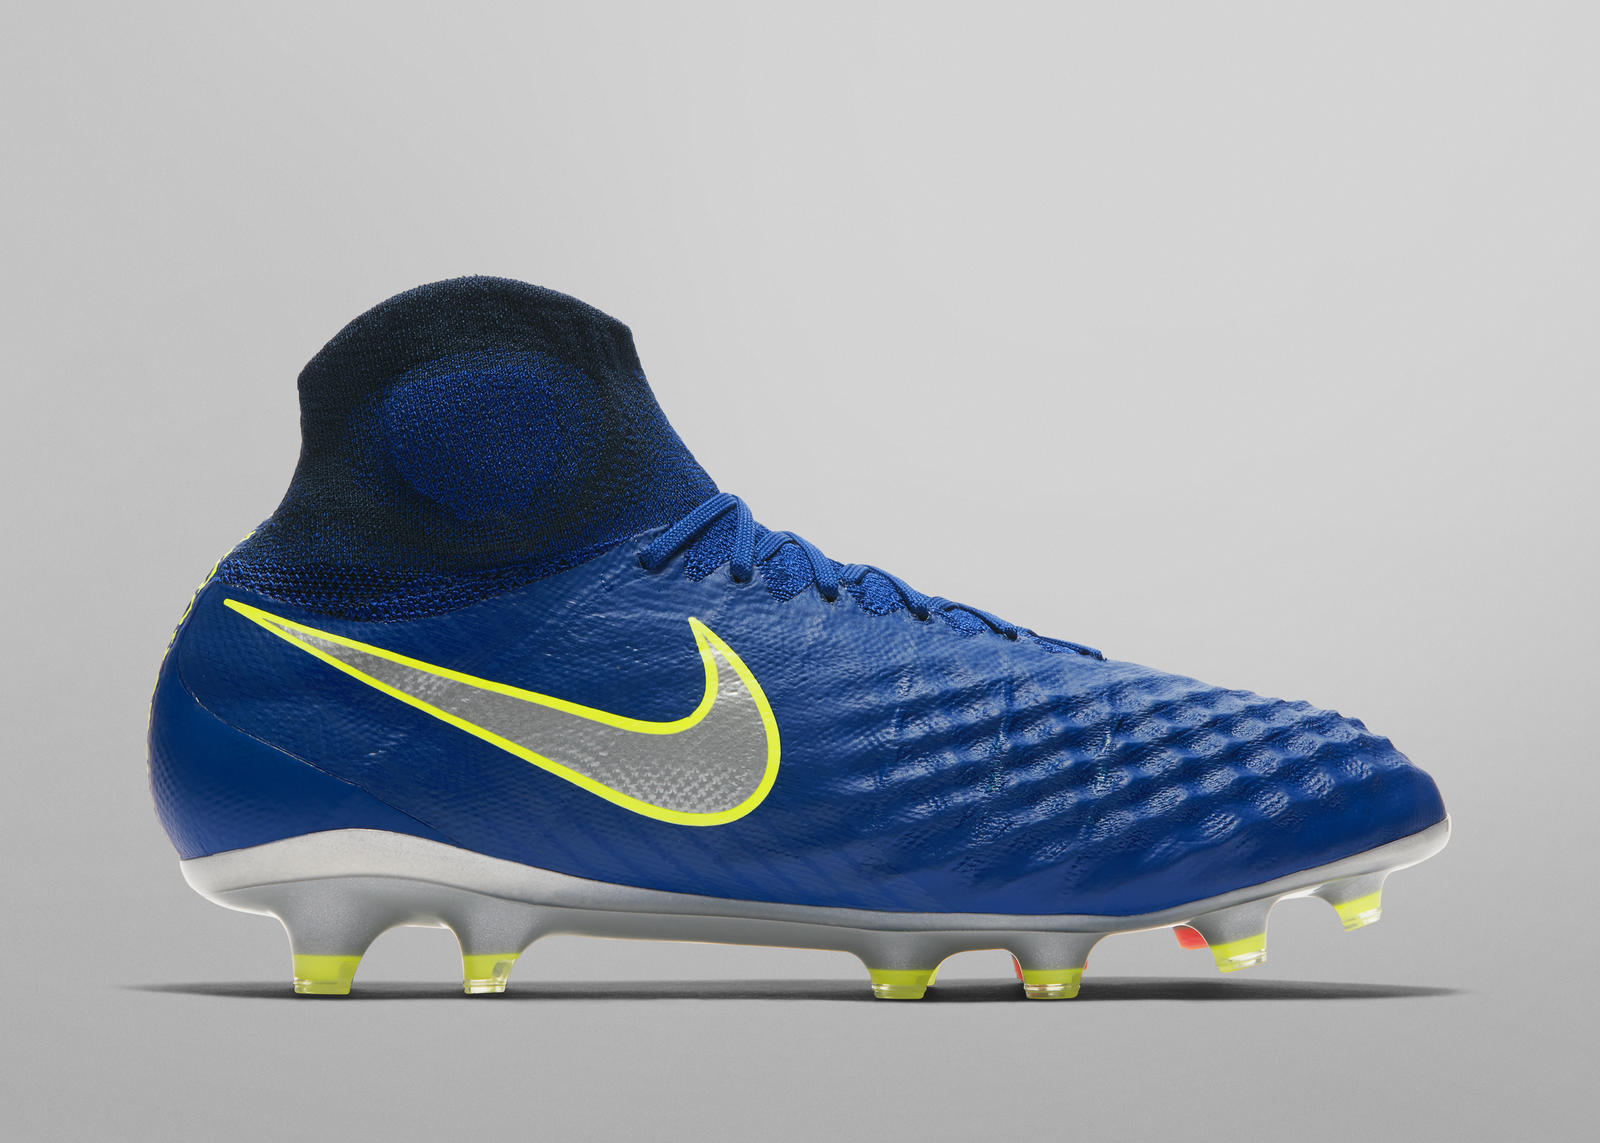 Nike Magista Obra 2 - time to shine pack